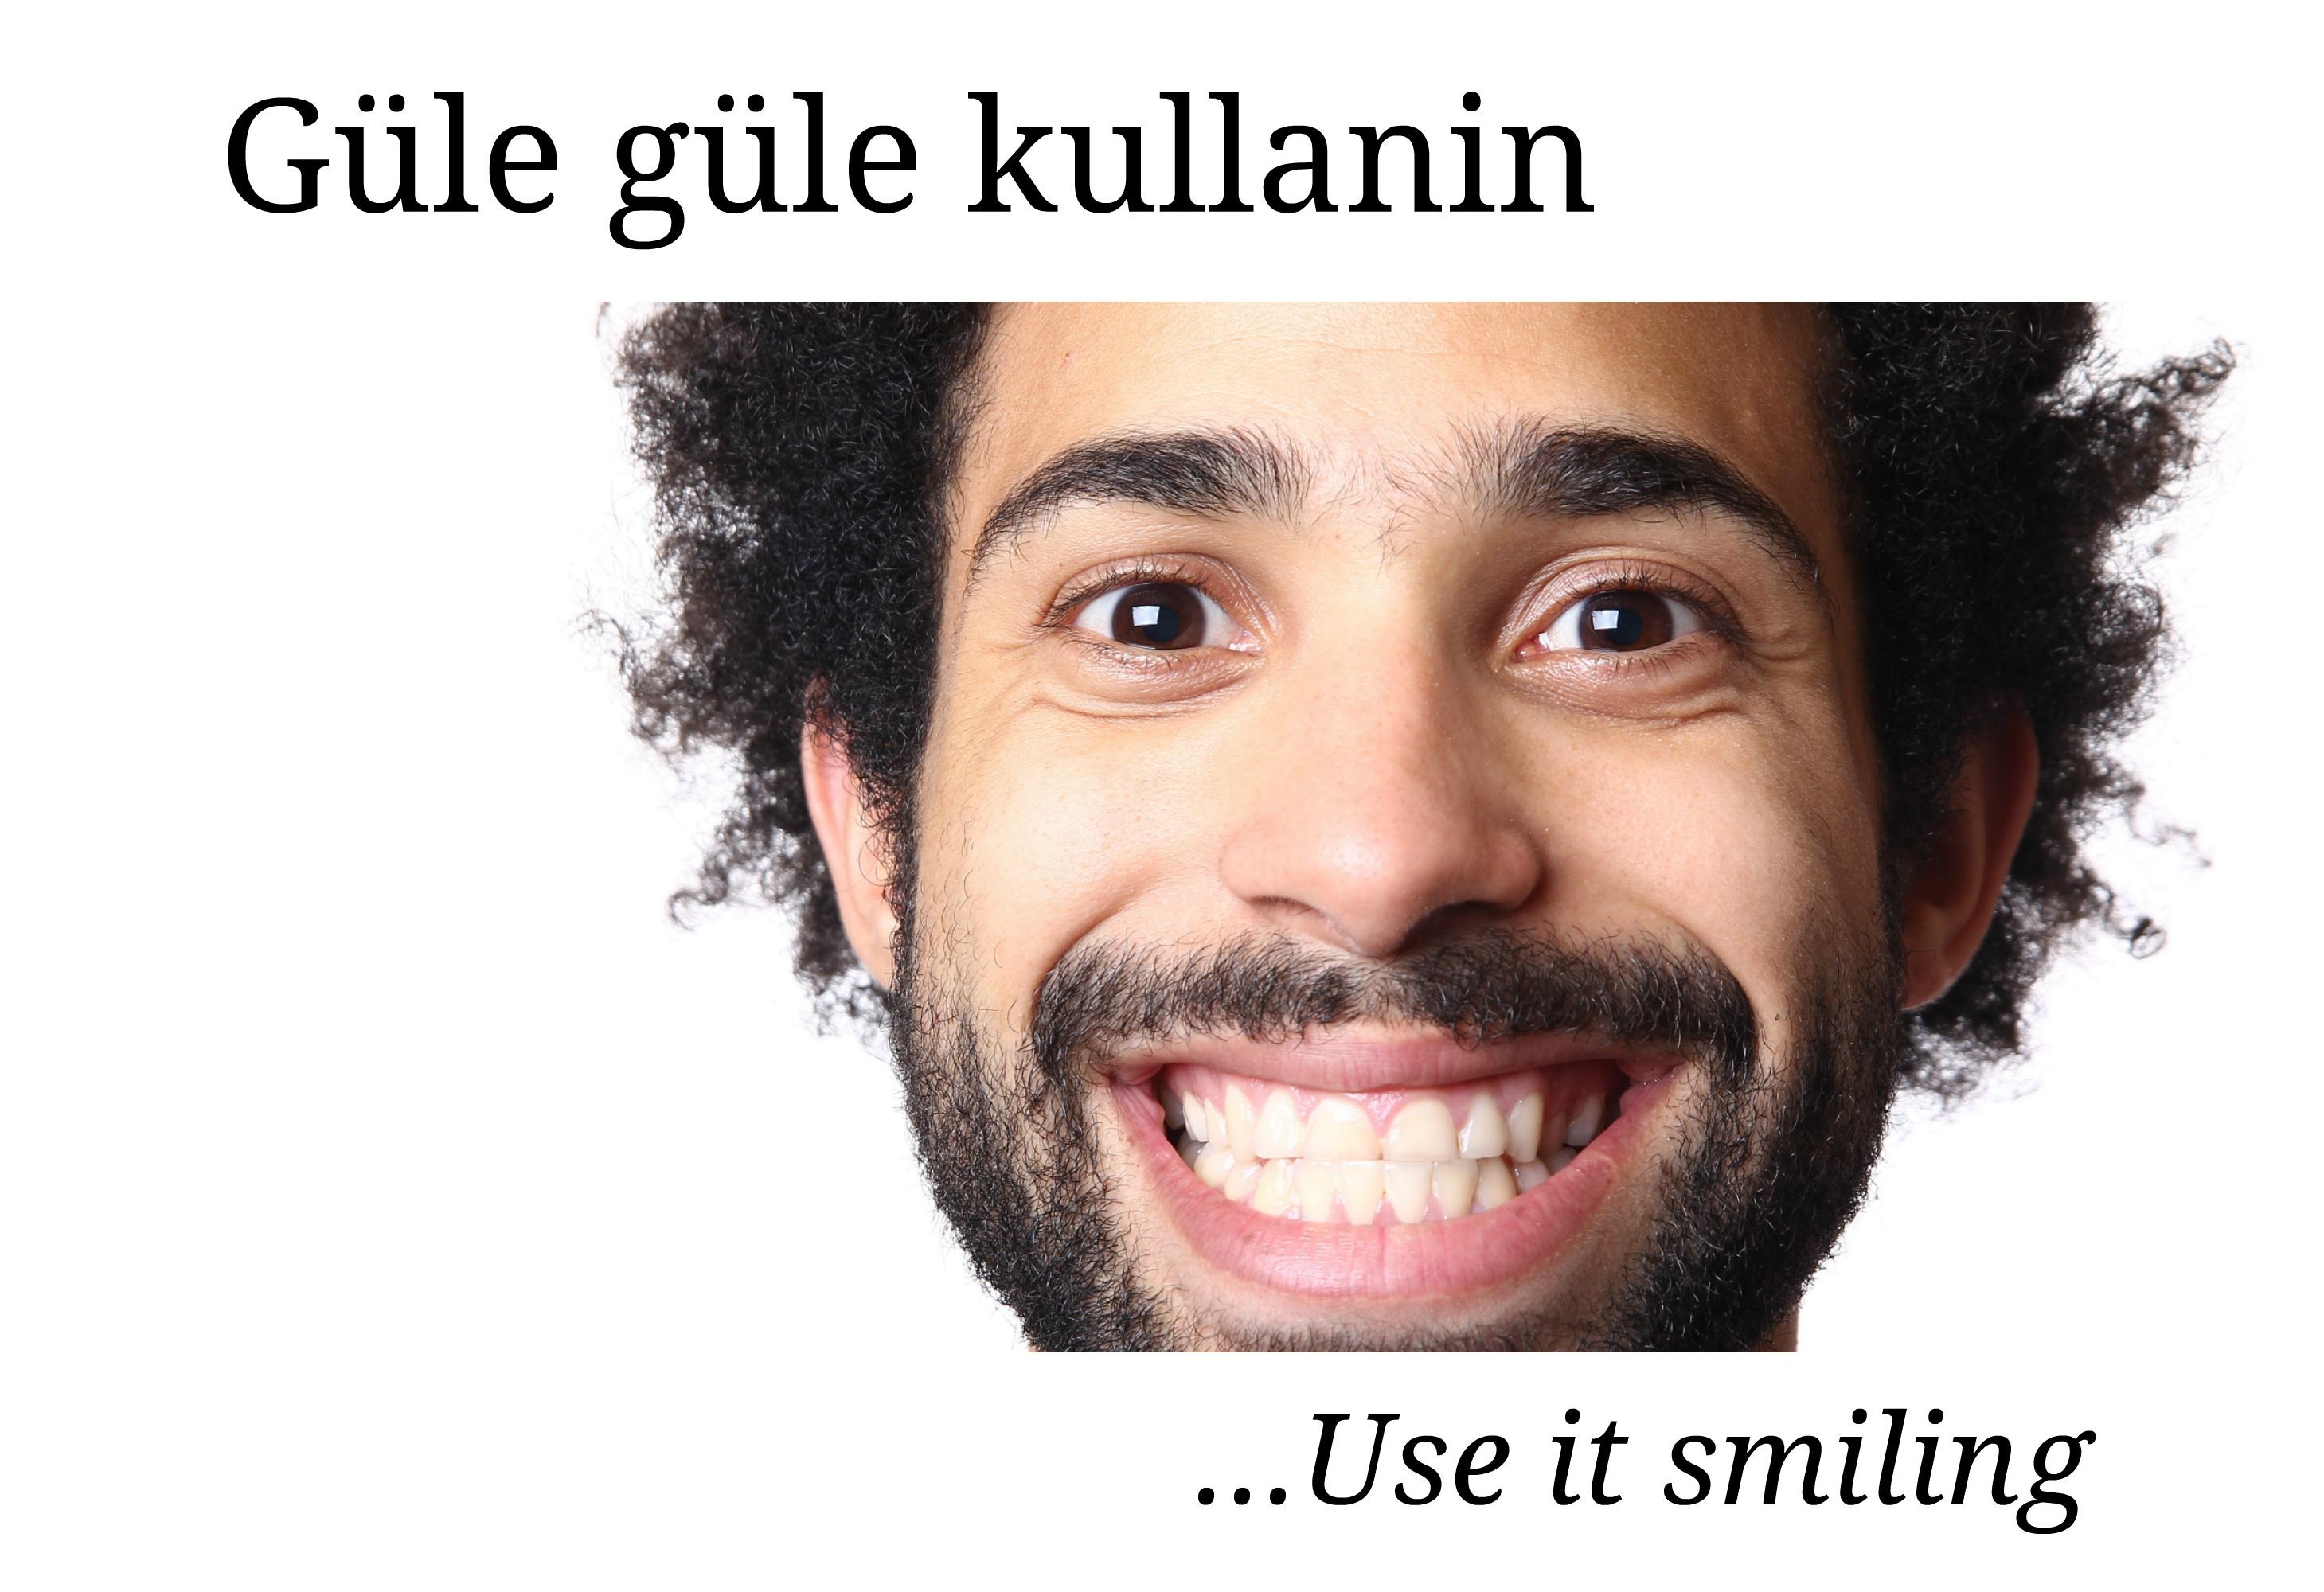 Gule gule kullanin - Turkish proverb